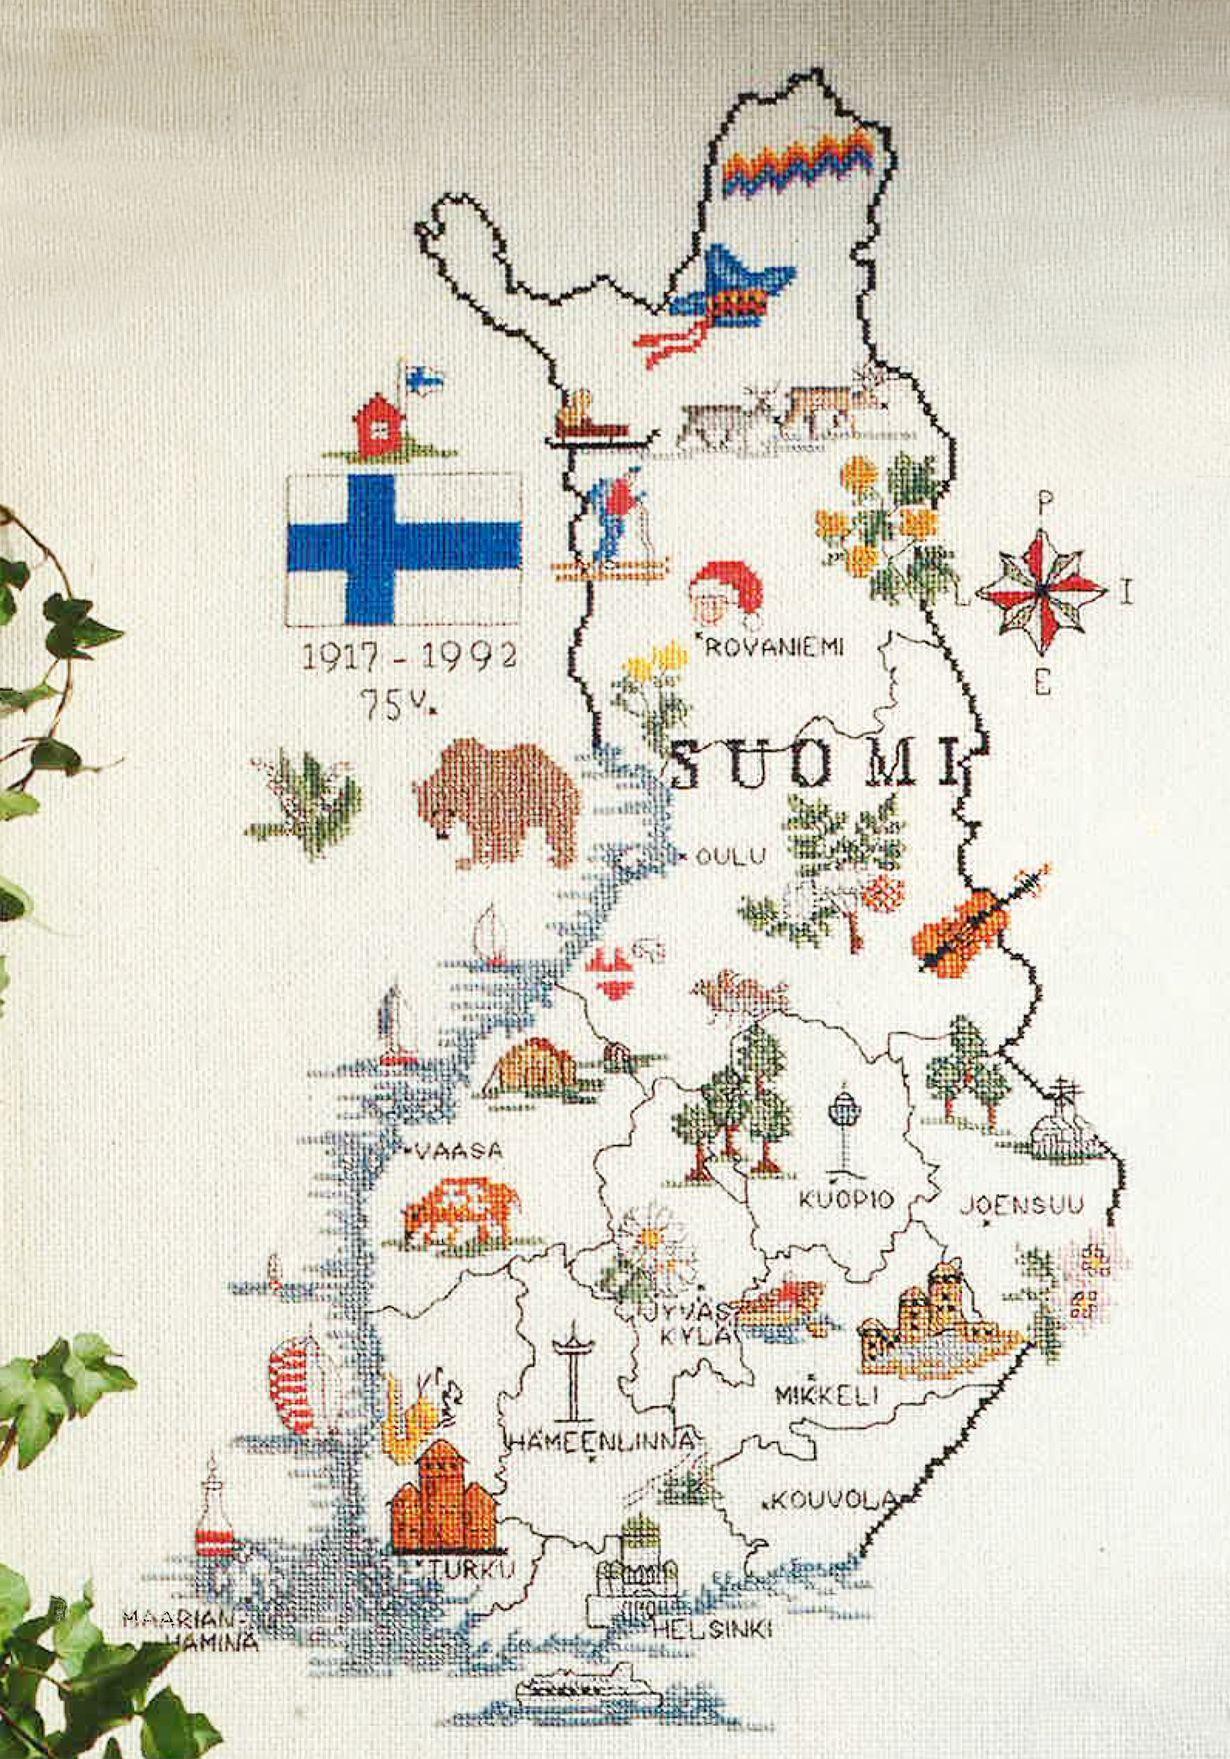 Kirjo Suomen Kartta Finnish Language Finland Rovaniemi